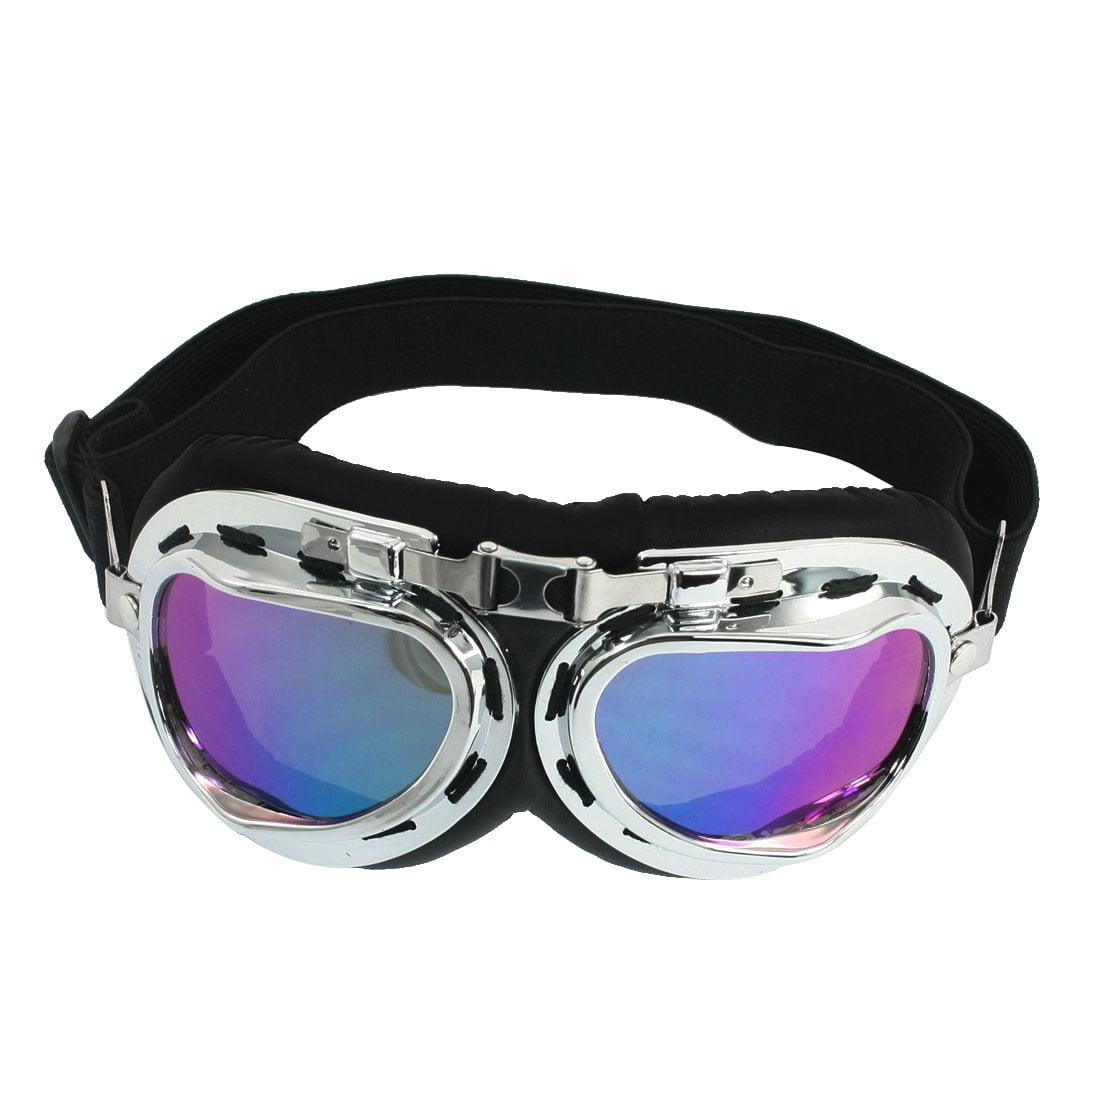 Ladies Man Metal Frame Silver Tone Rim Adjustable Strap Ski Goggles by